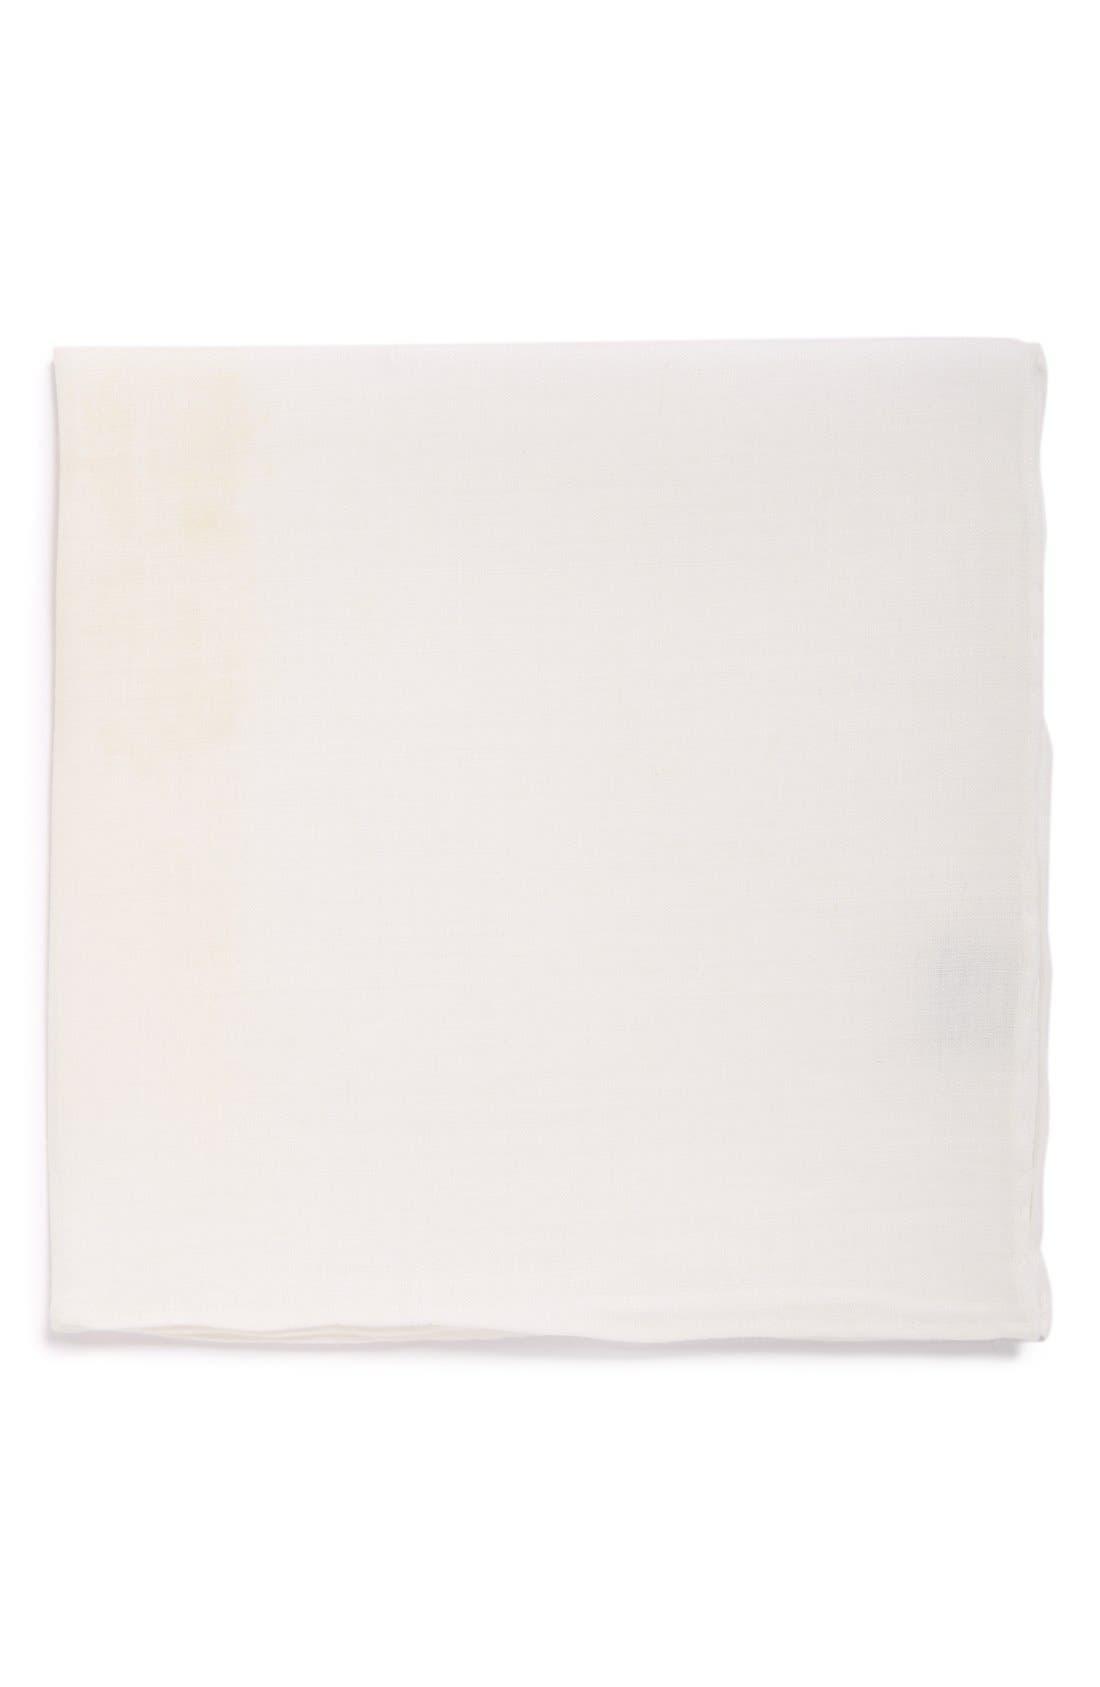 Solid Linen Pocket Square,                         Main,                         color,